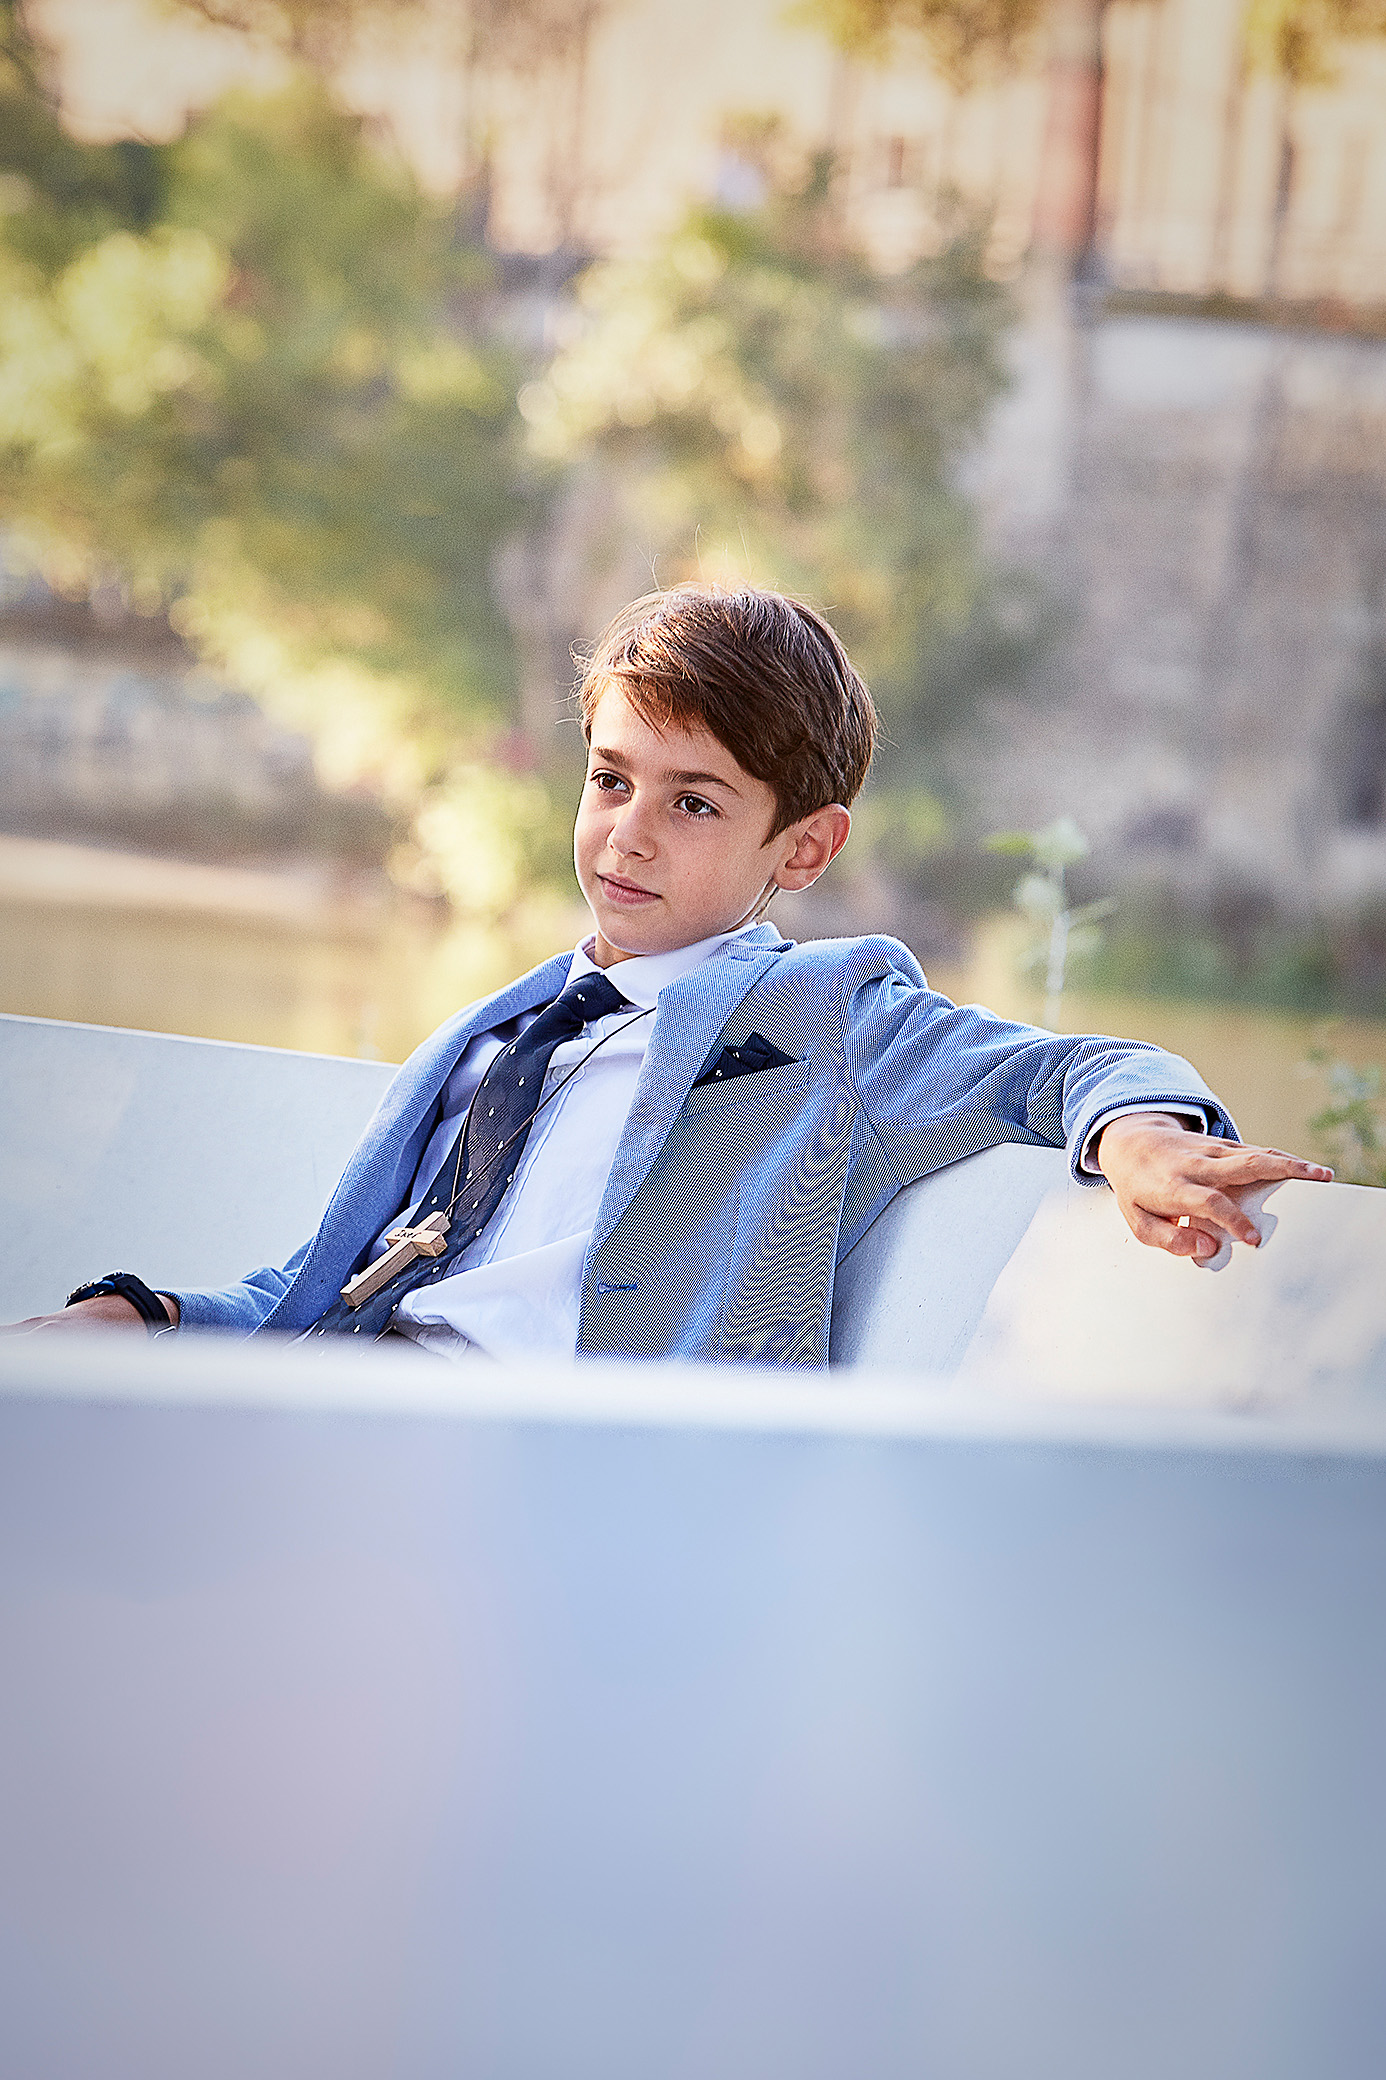 https://www.kidsphotography.es/wp-content/uploads/2020/09/Iker_8820-©-Ruben-Baron-Photography.jpg